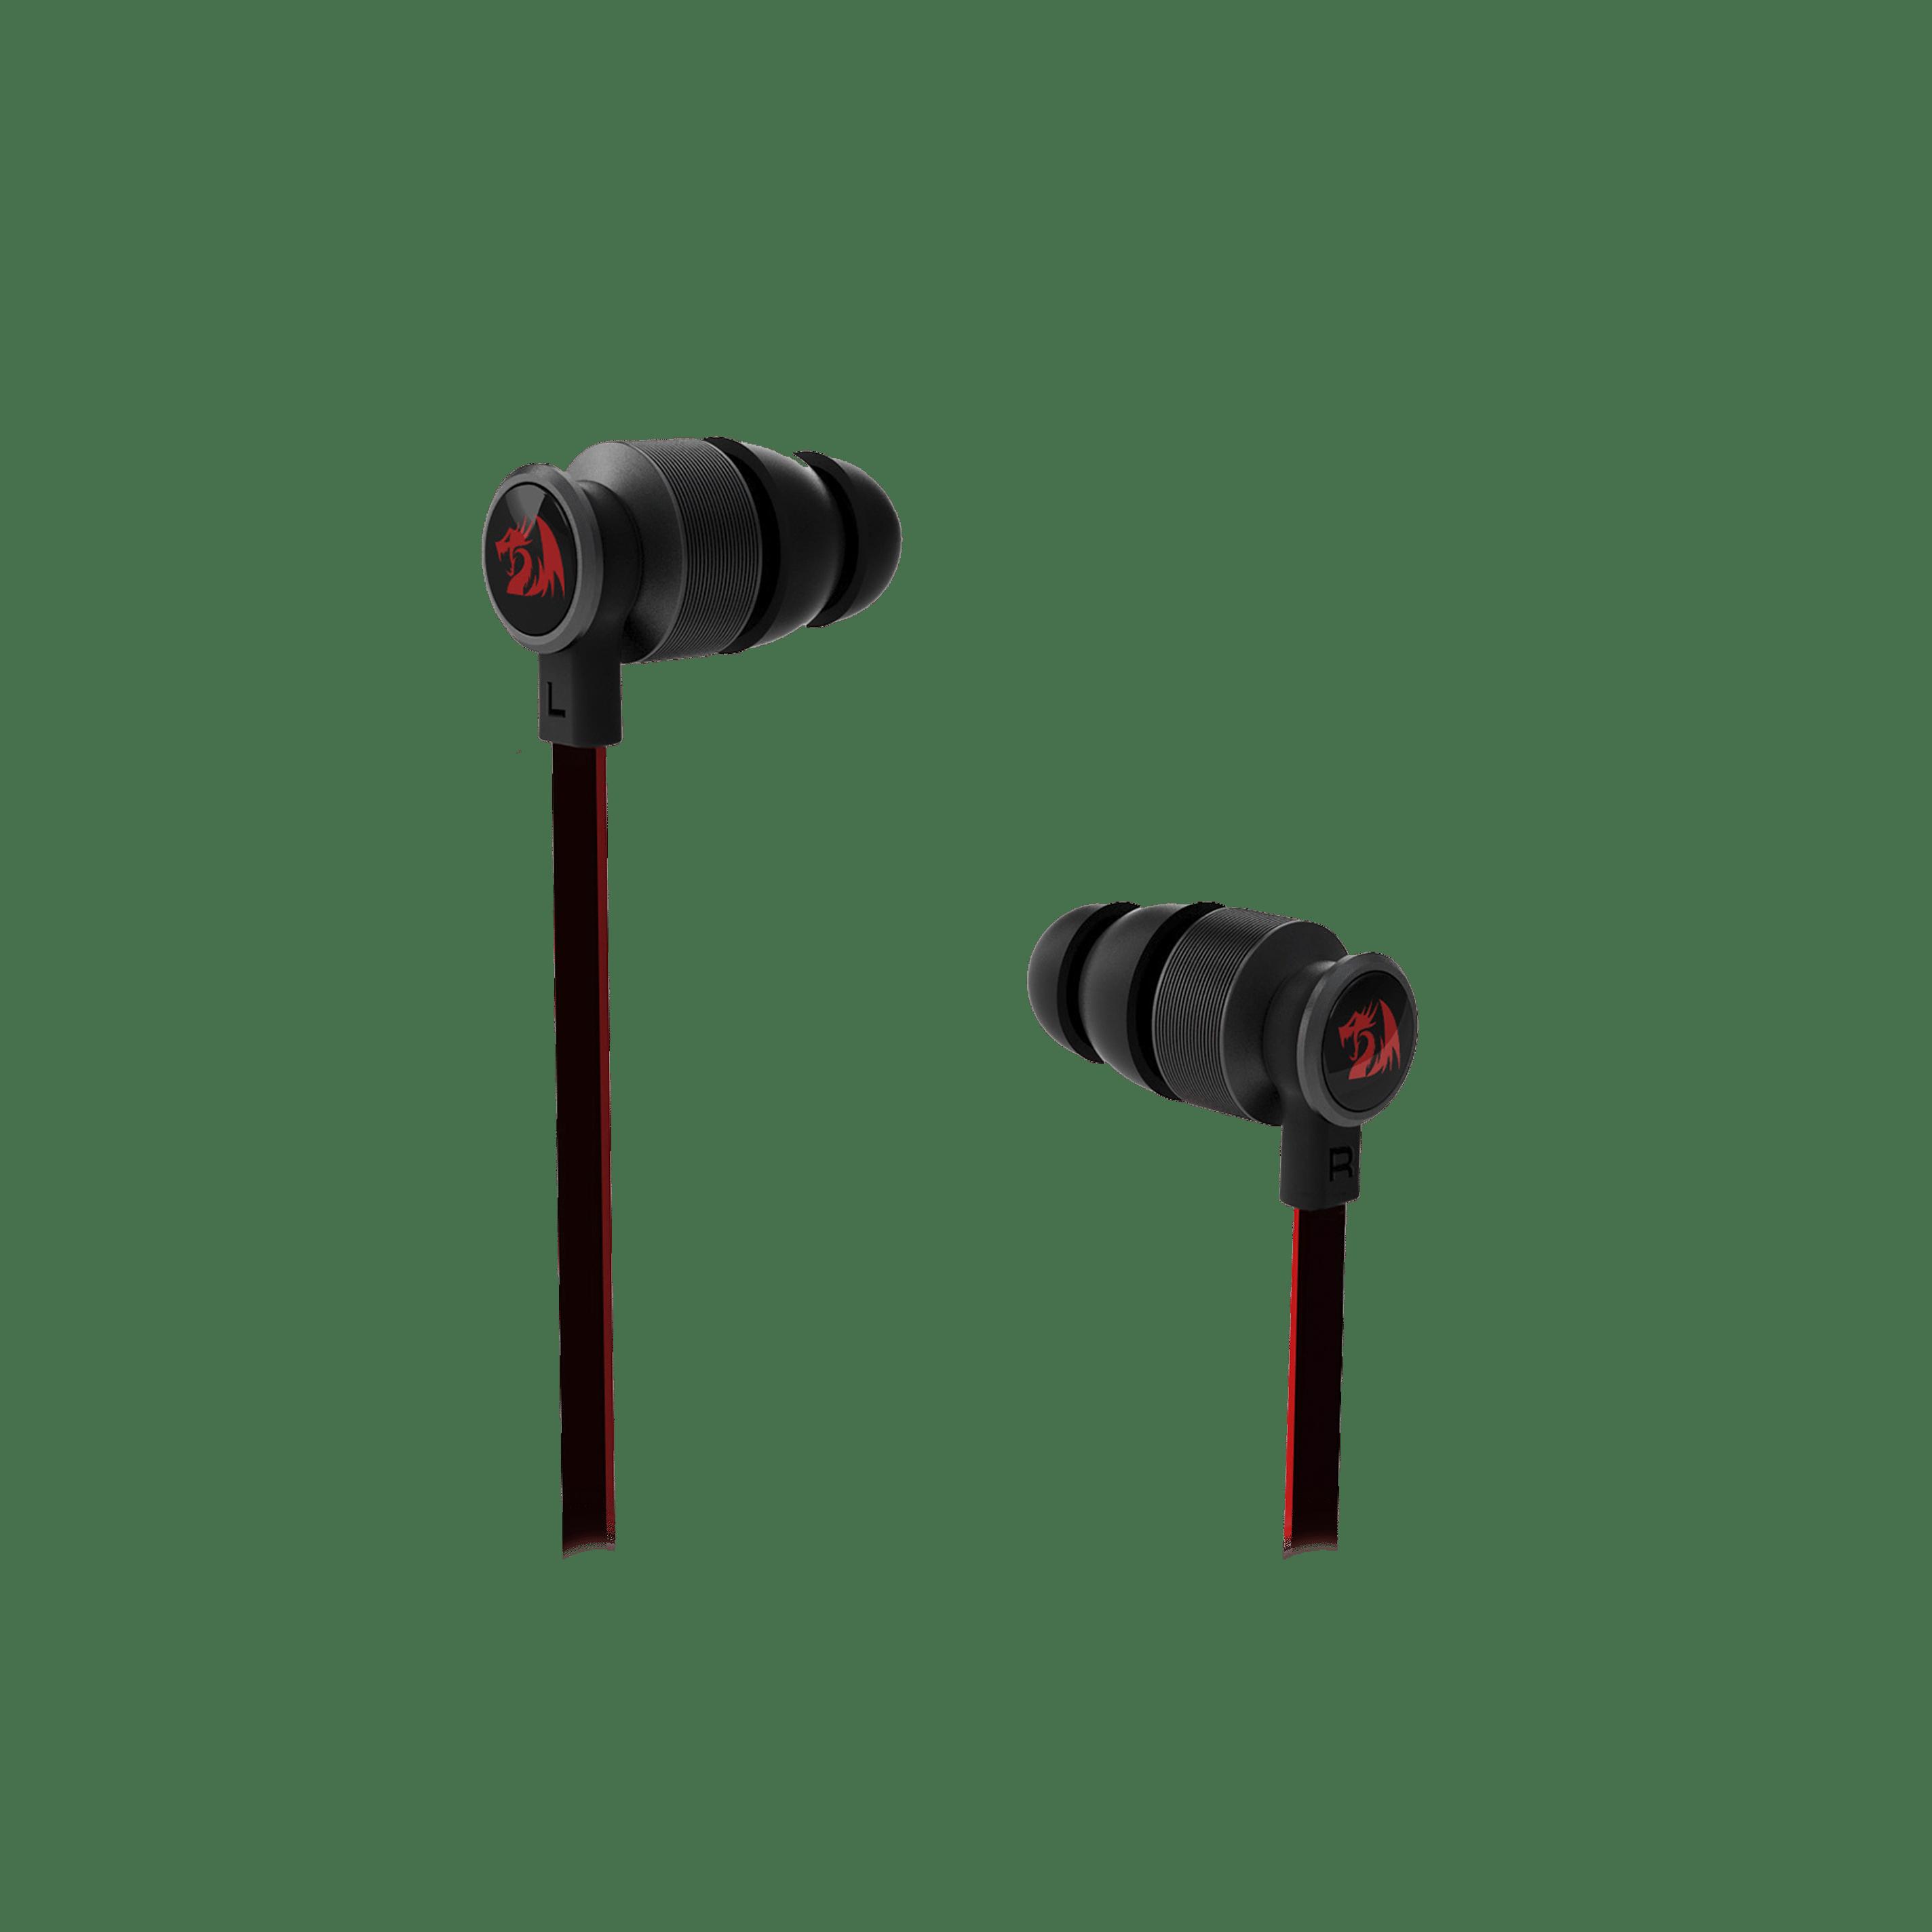 REDRAGON THUNDER PRO IN-EAR HEADPHONES